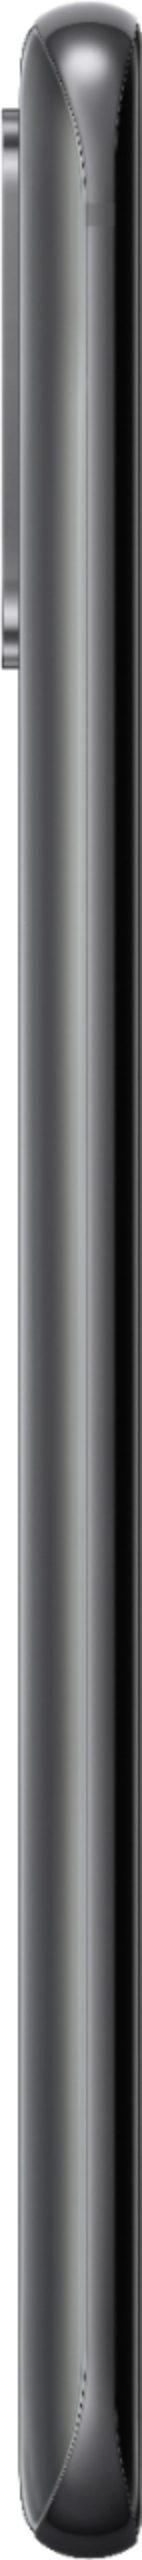 Samsung Galaxy S20+ DUAL (SM-G985F) Gray - 5